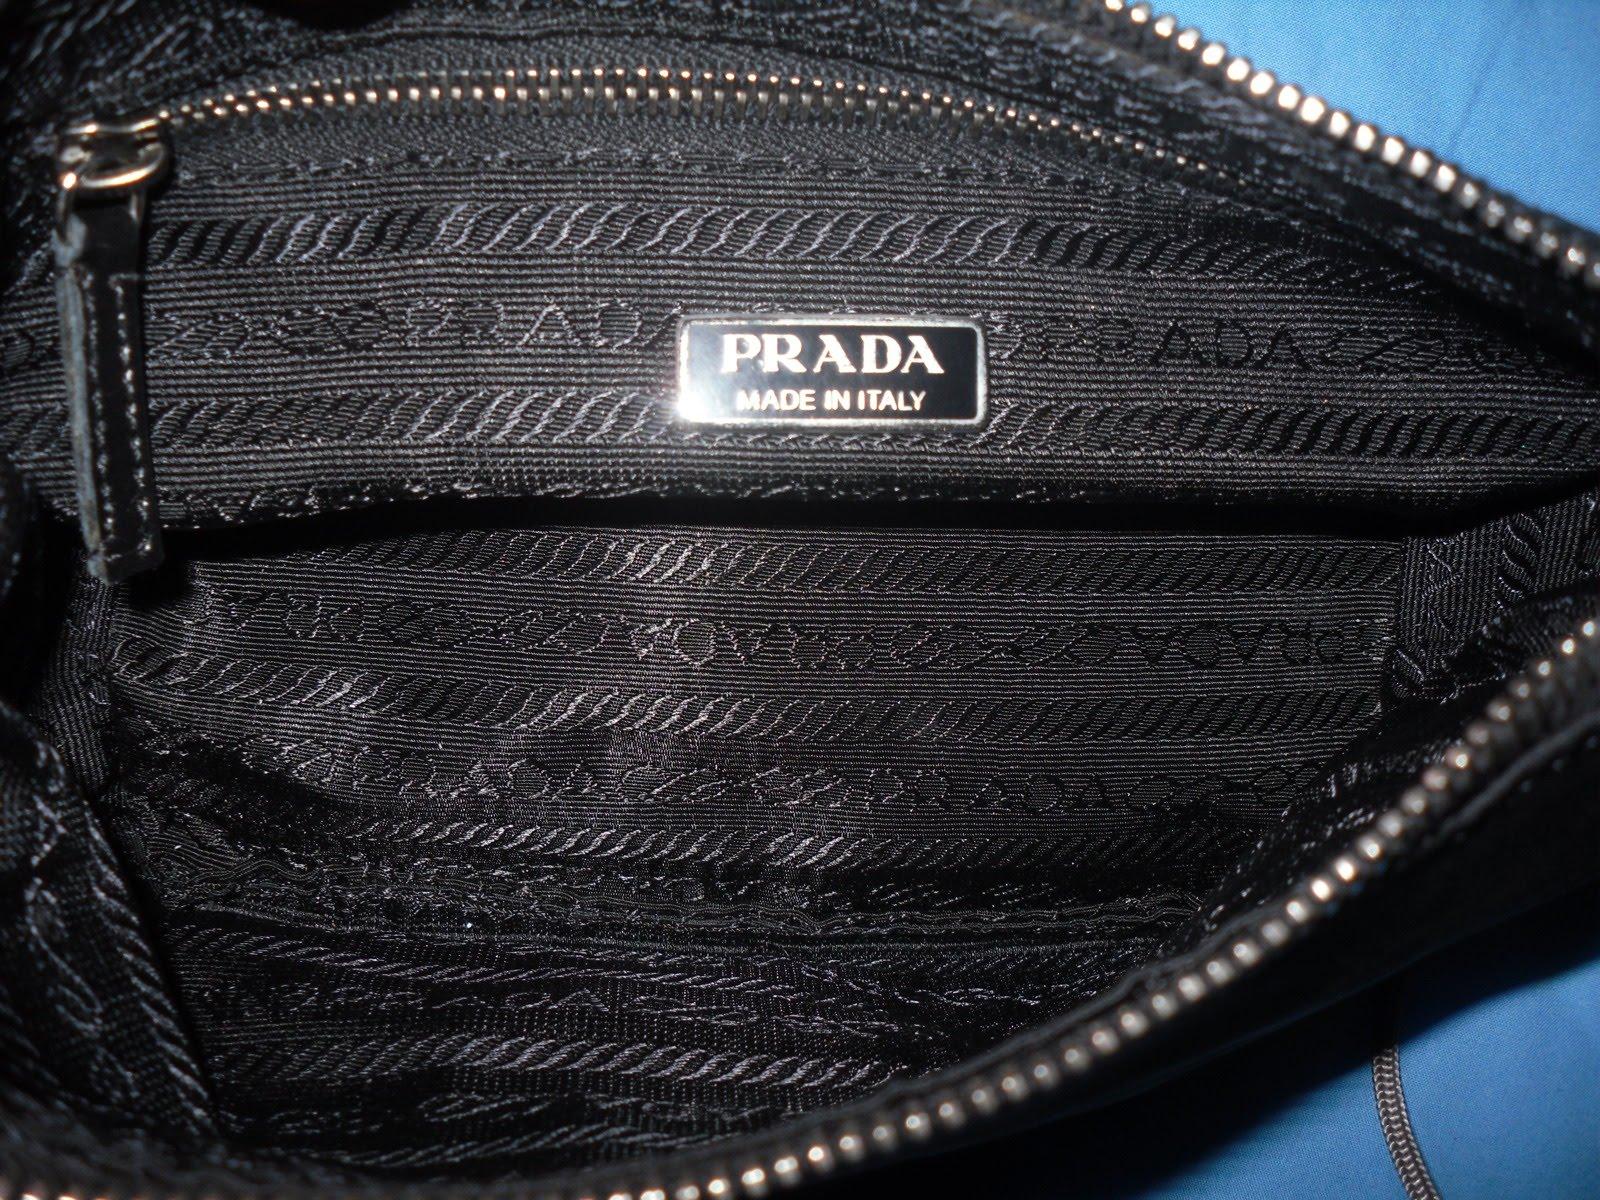 prada bags handbags - prada zaino nylon nero